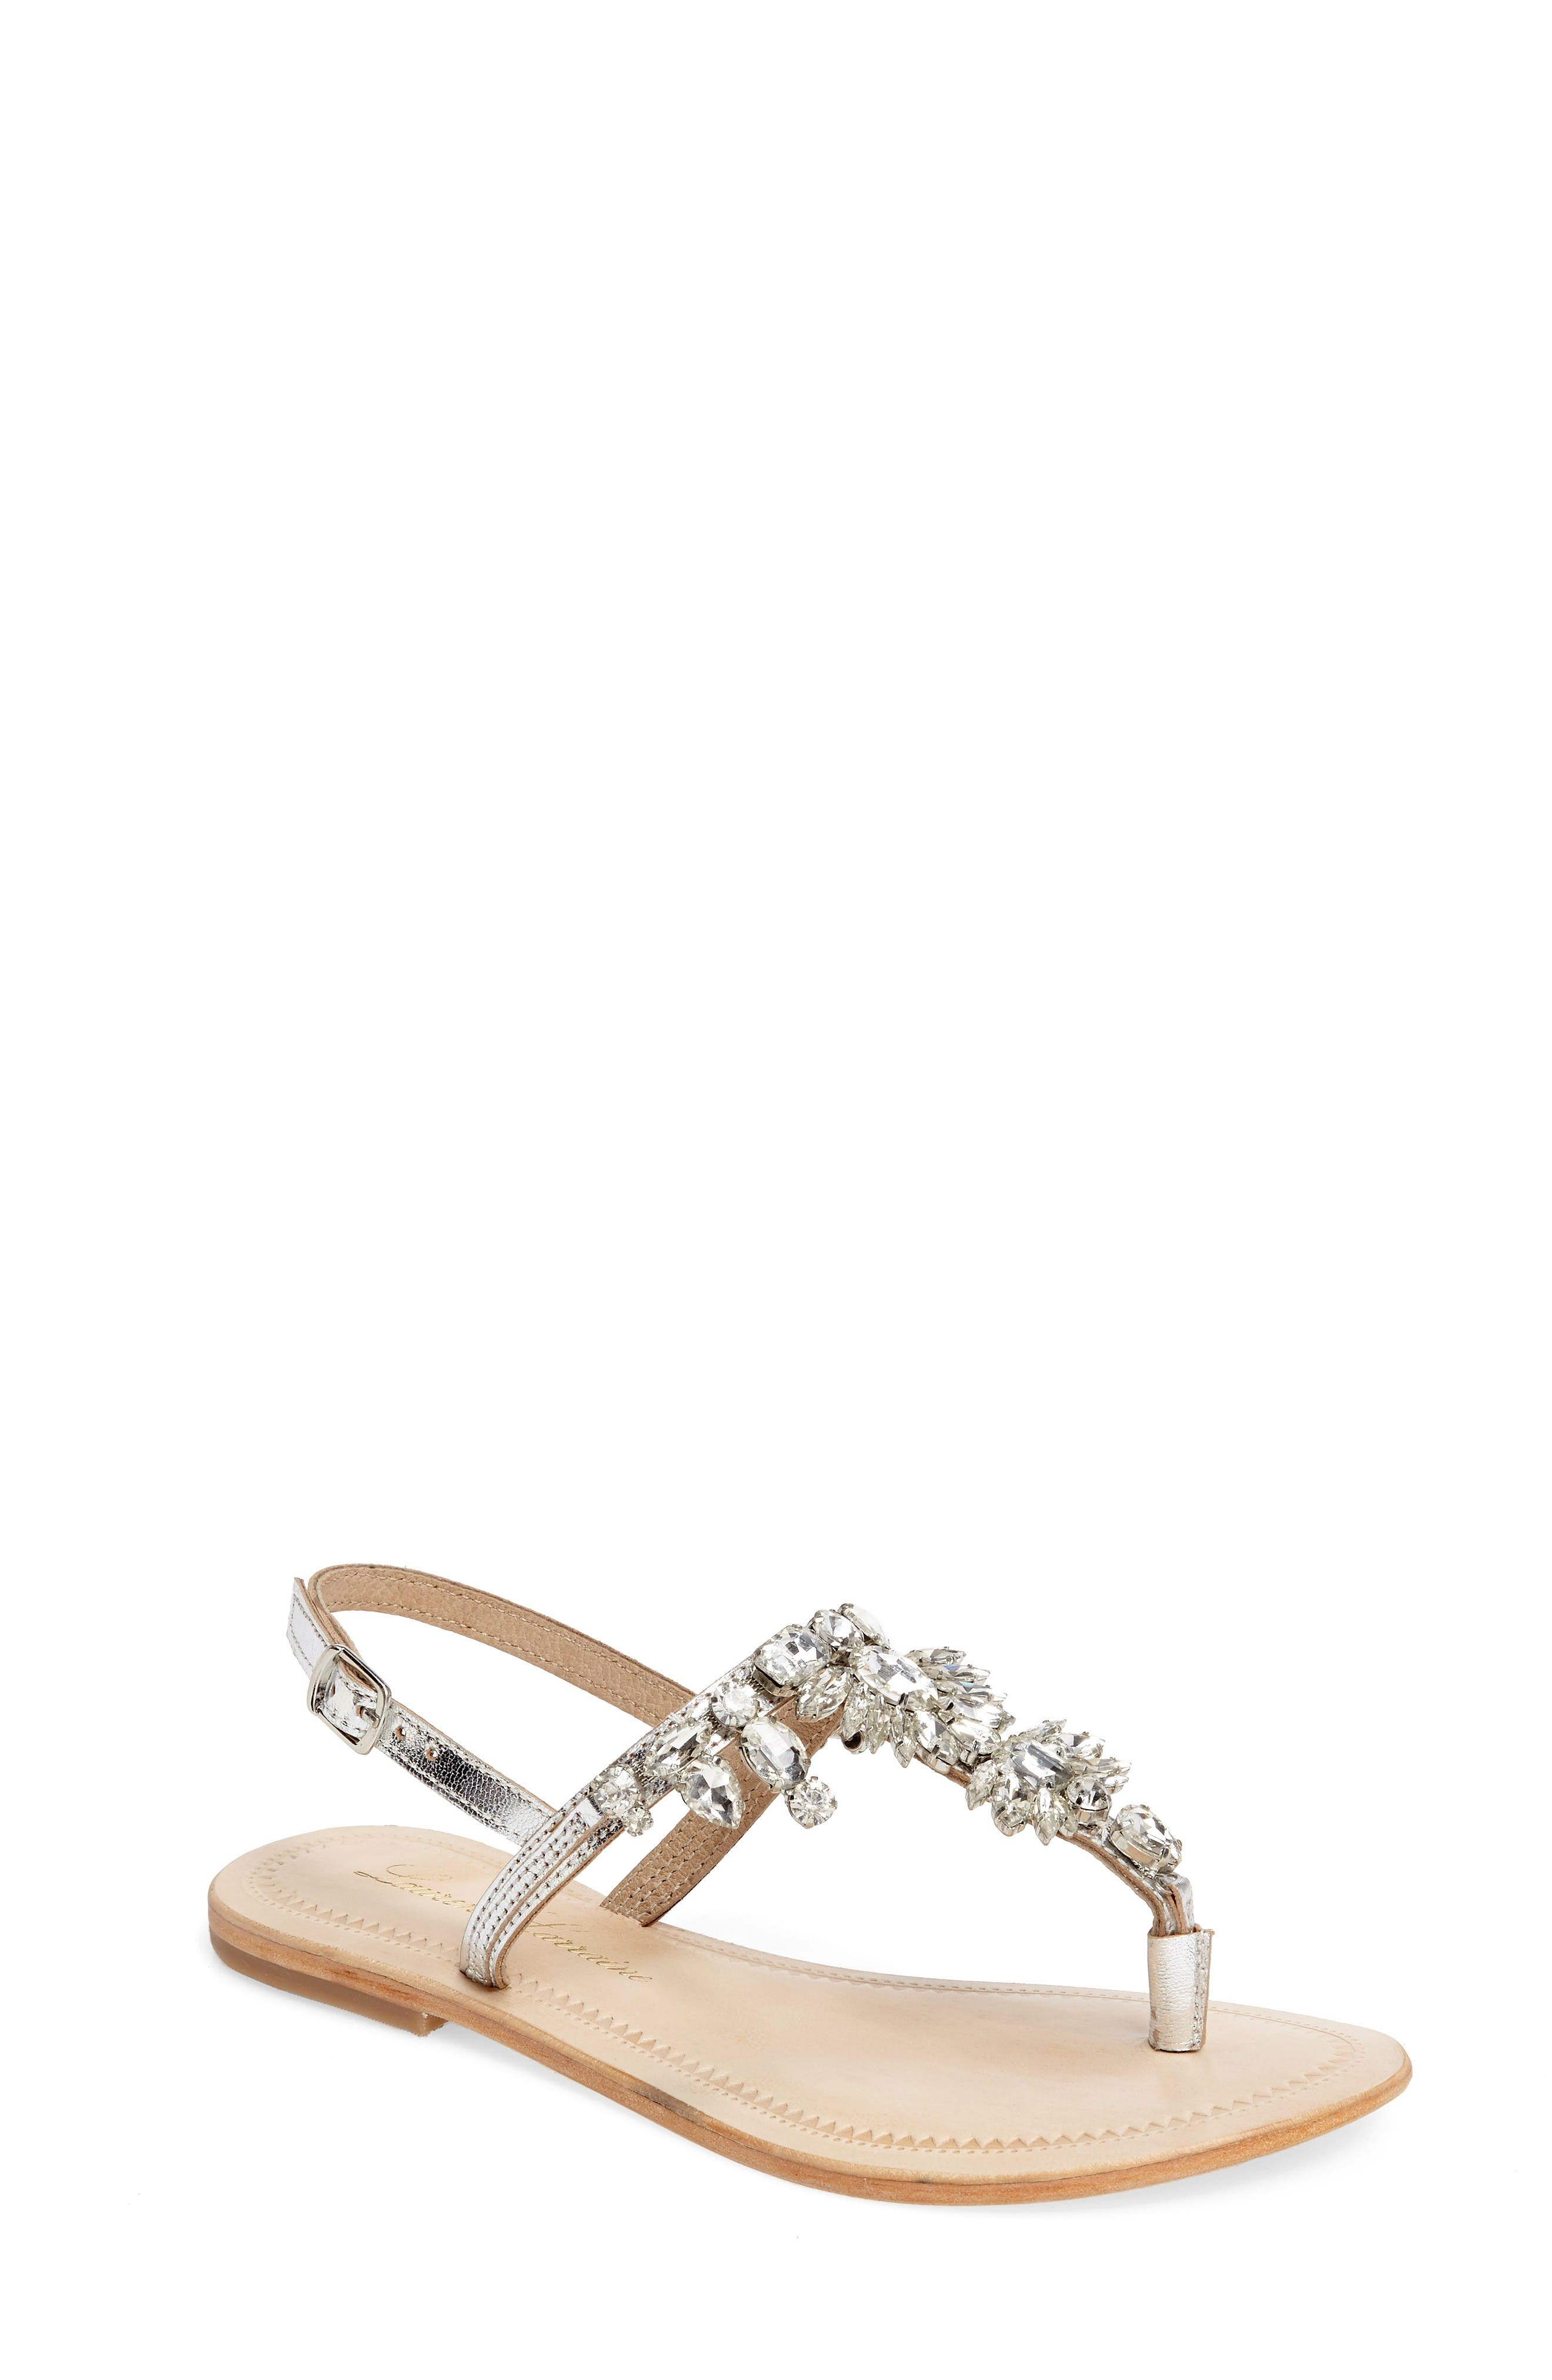 Lauren Lorraine Bermuda Embellished Sandal (Women)